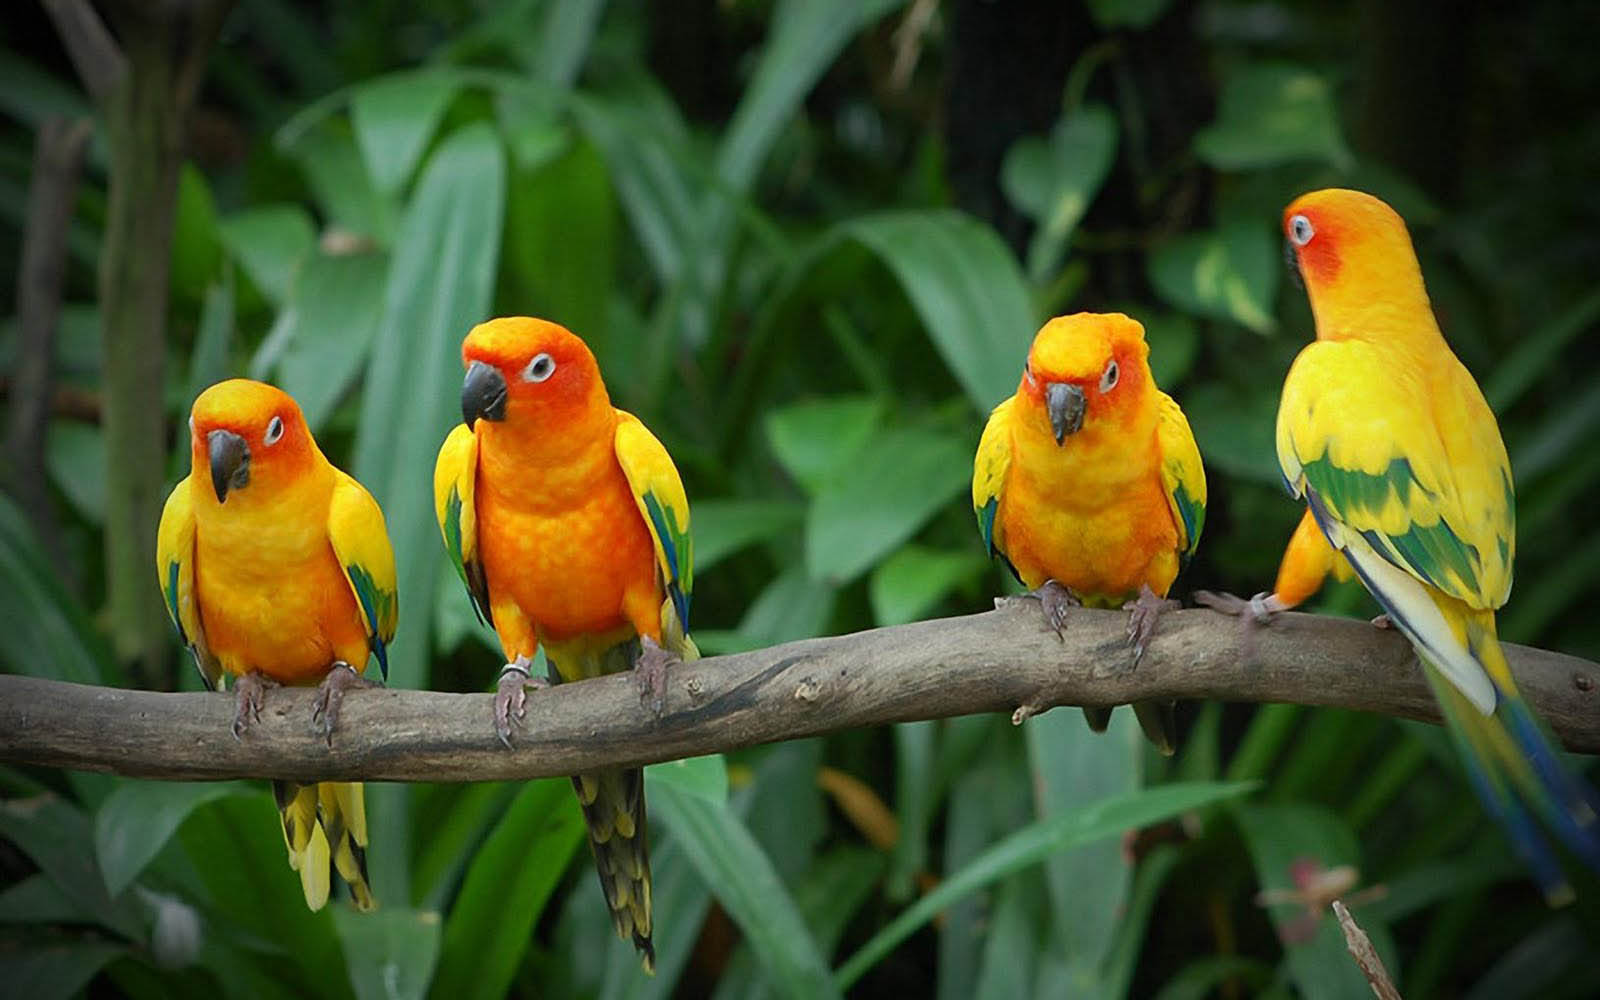 Wallpapers Love Birds: Wallpapers: Love Birds Wallpapers